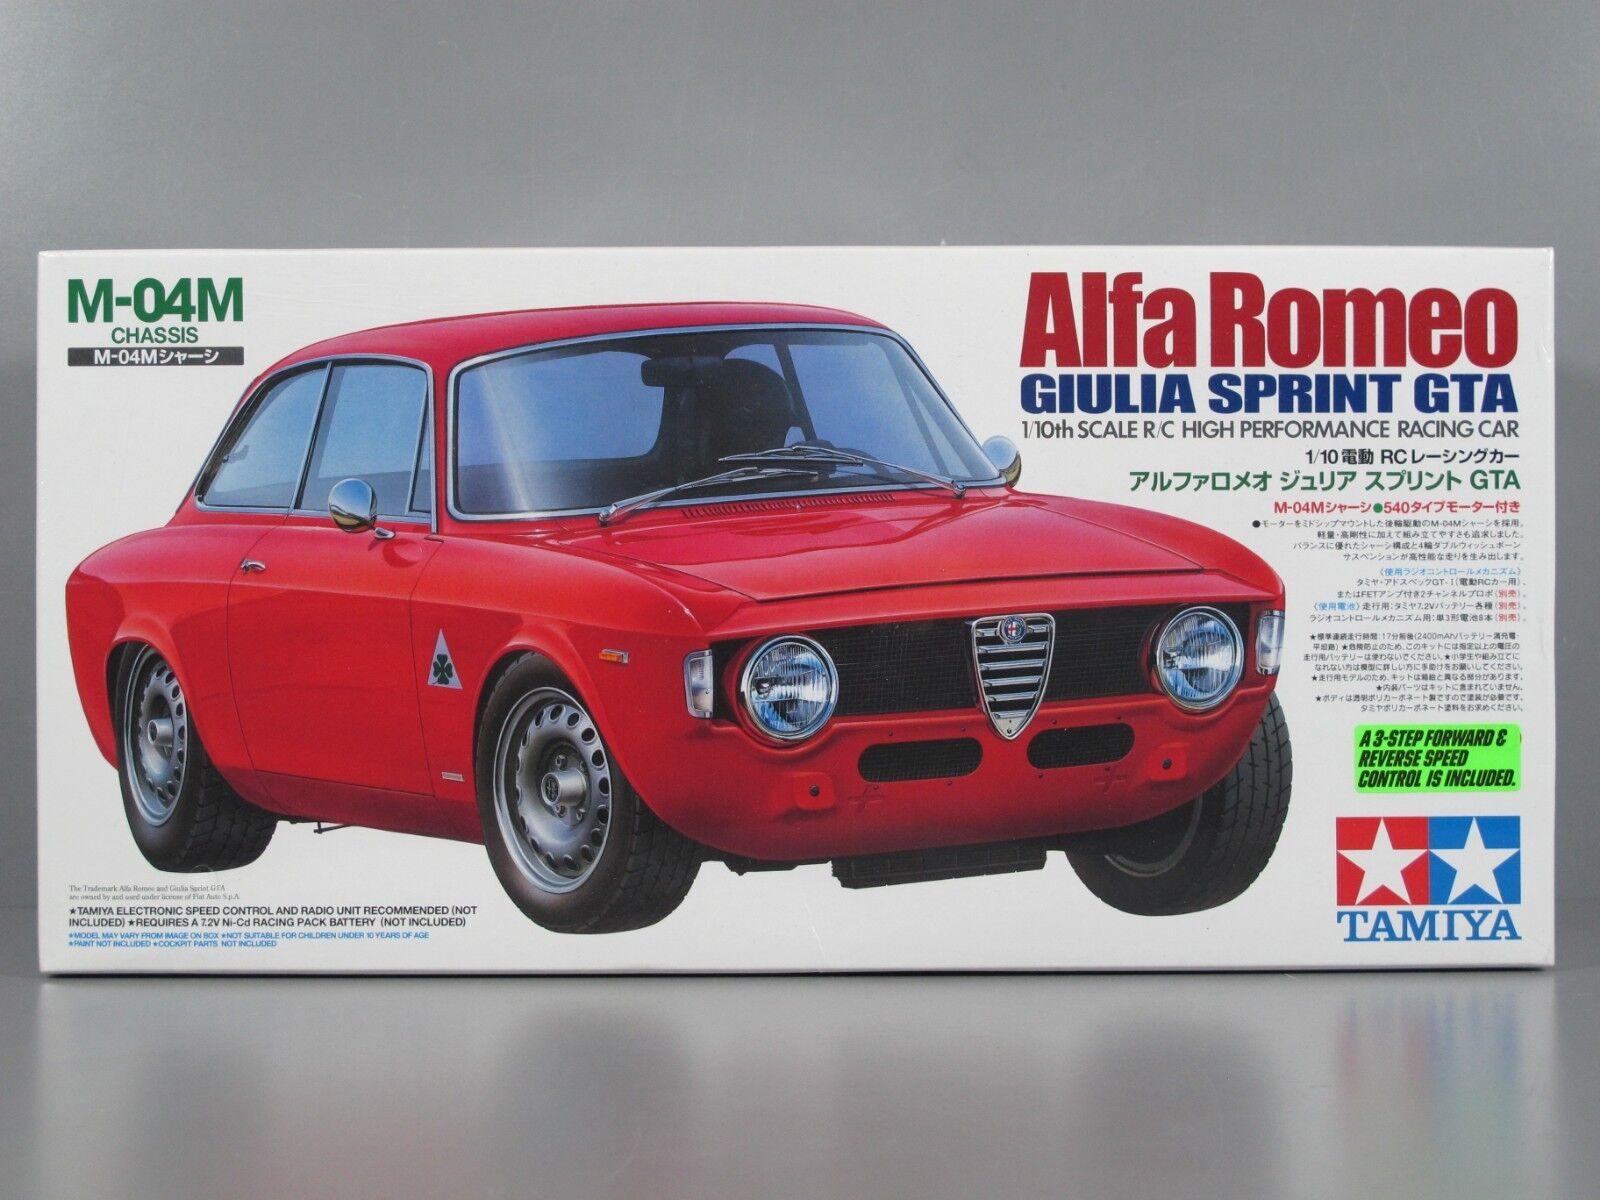 Rare Nuovo Seal Box Tamiya 1/10 R/C Alfa Romeo Gilia Sprint GTA M-04M Chasis 58307